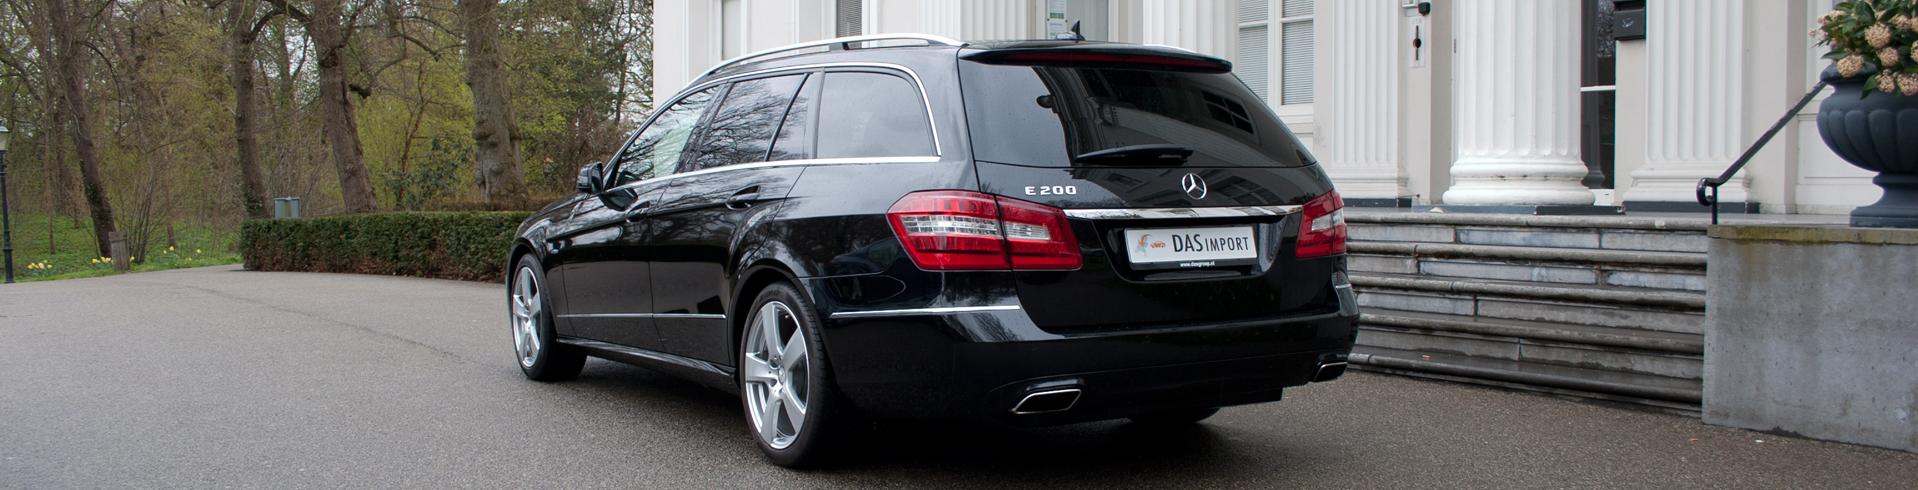 Mercedes-Benz-E-klasse-uit-Duitsland